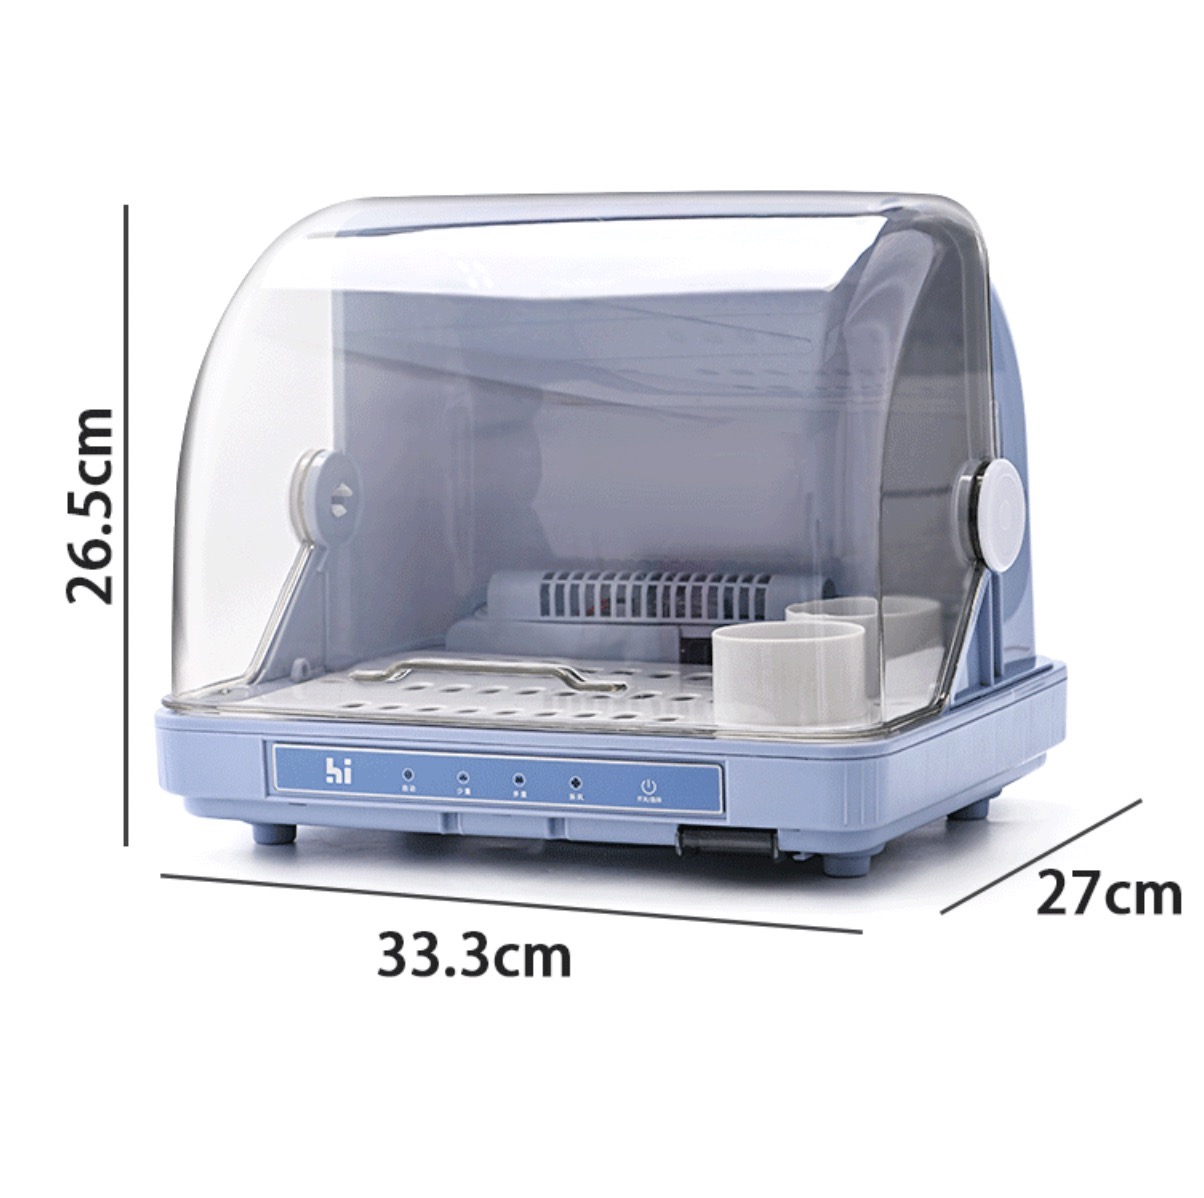 BESTIN 百樱 WT-28A 婴儿紫外线奶瓶消毒器 标配款 静谧蓝